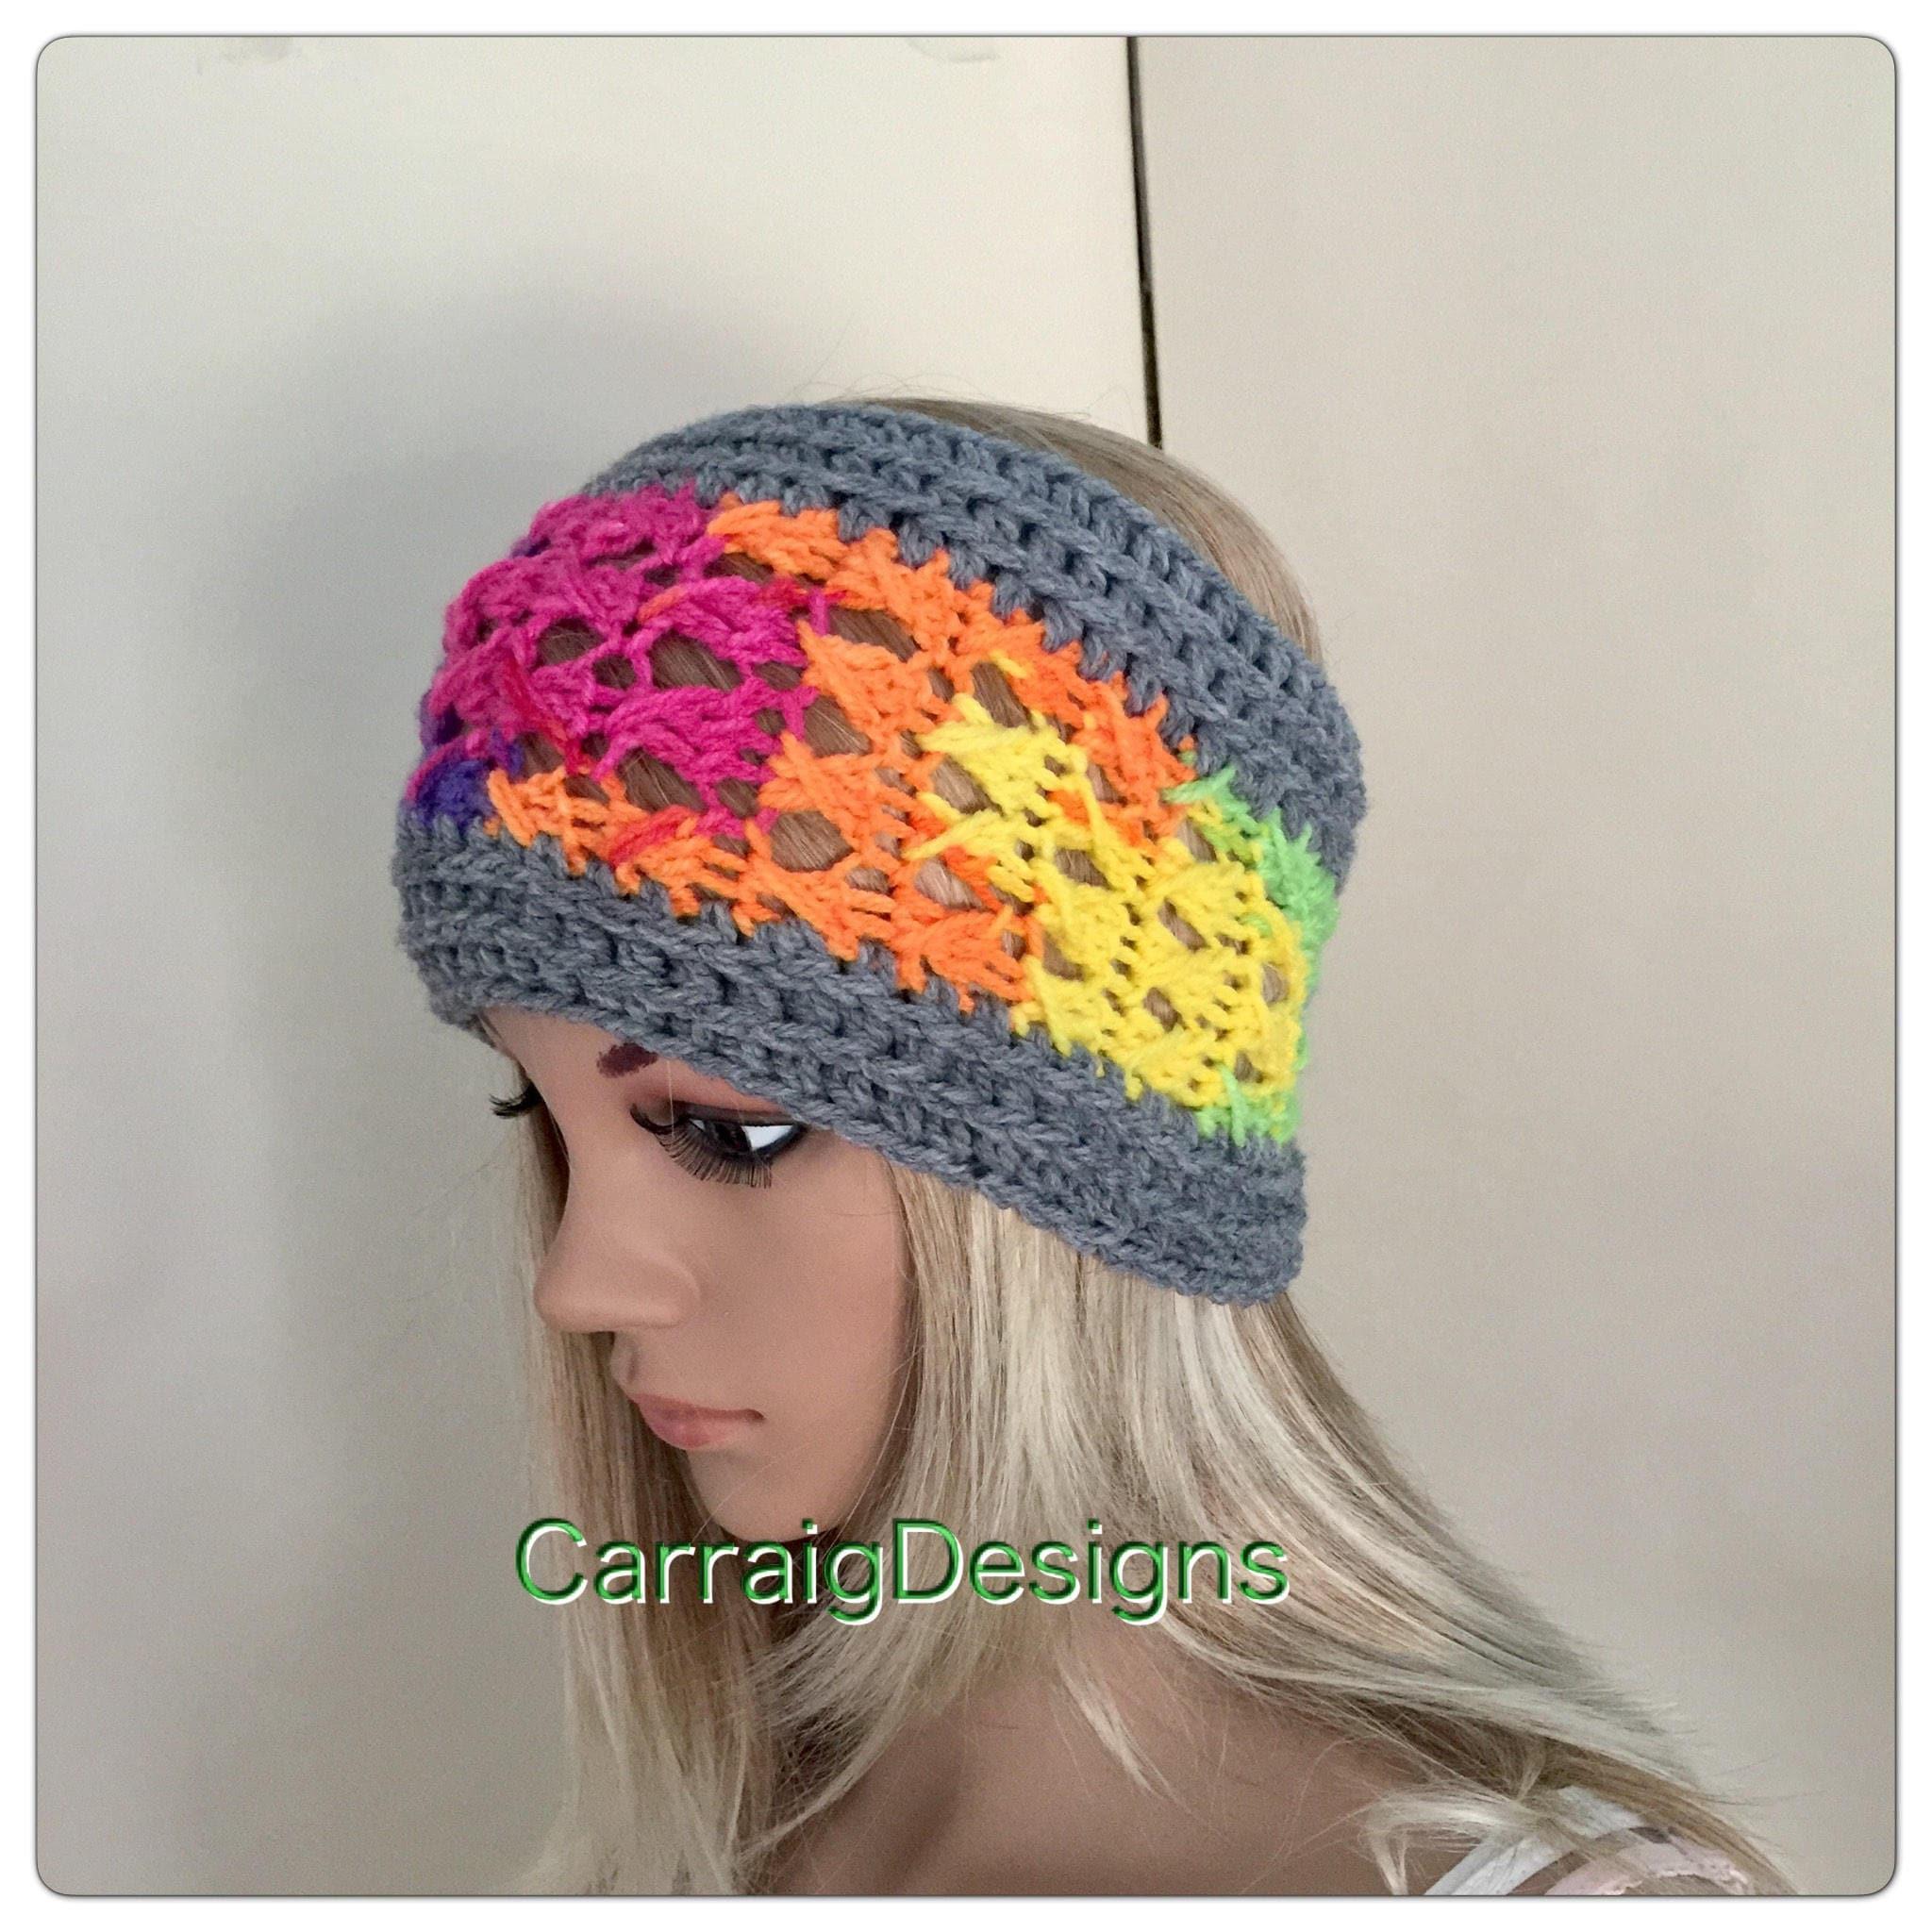 Rainbow headband womens teens hand crocheted knit dread tube wrap hippy  hippie ooak boho ear warmer dreadlock accessory ski unique designer 32abbd09d843